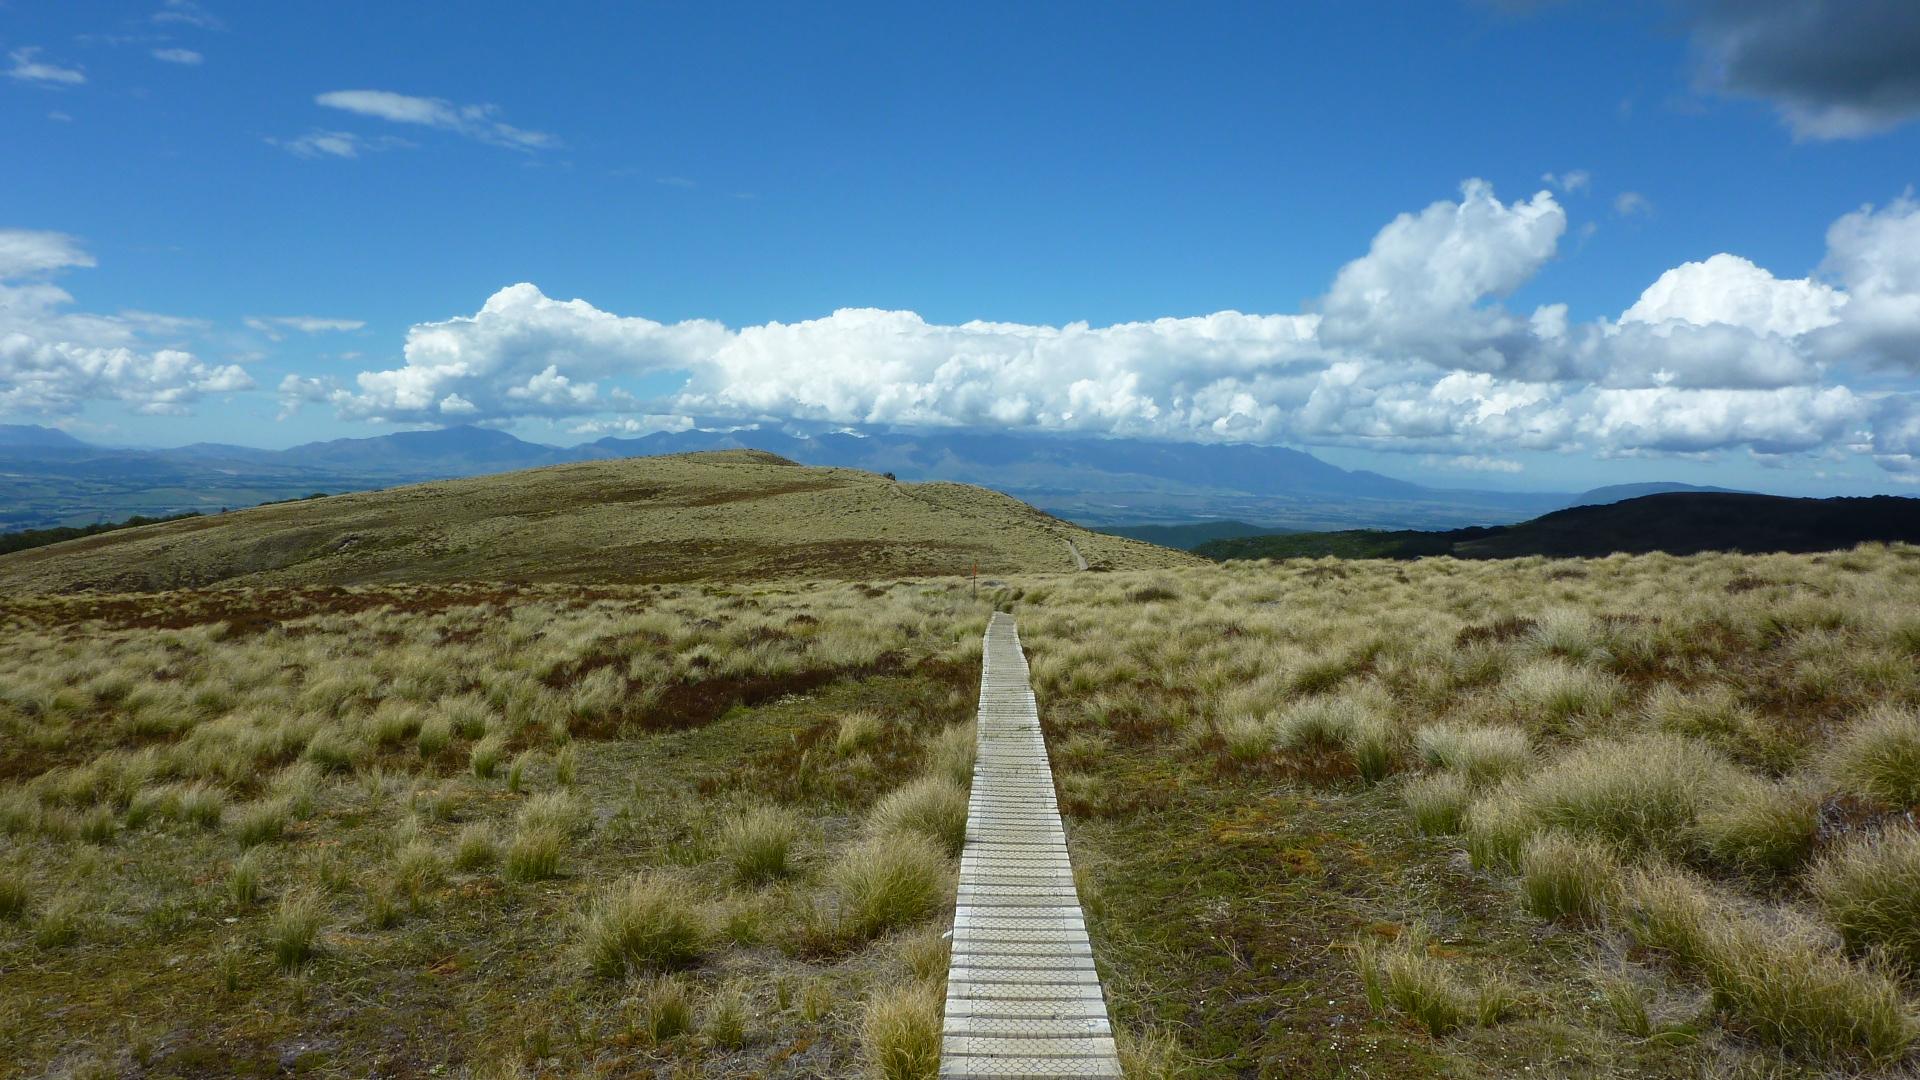 Wandern im Fiordland- auf den Spuren des Kepler Tracks